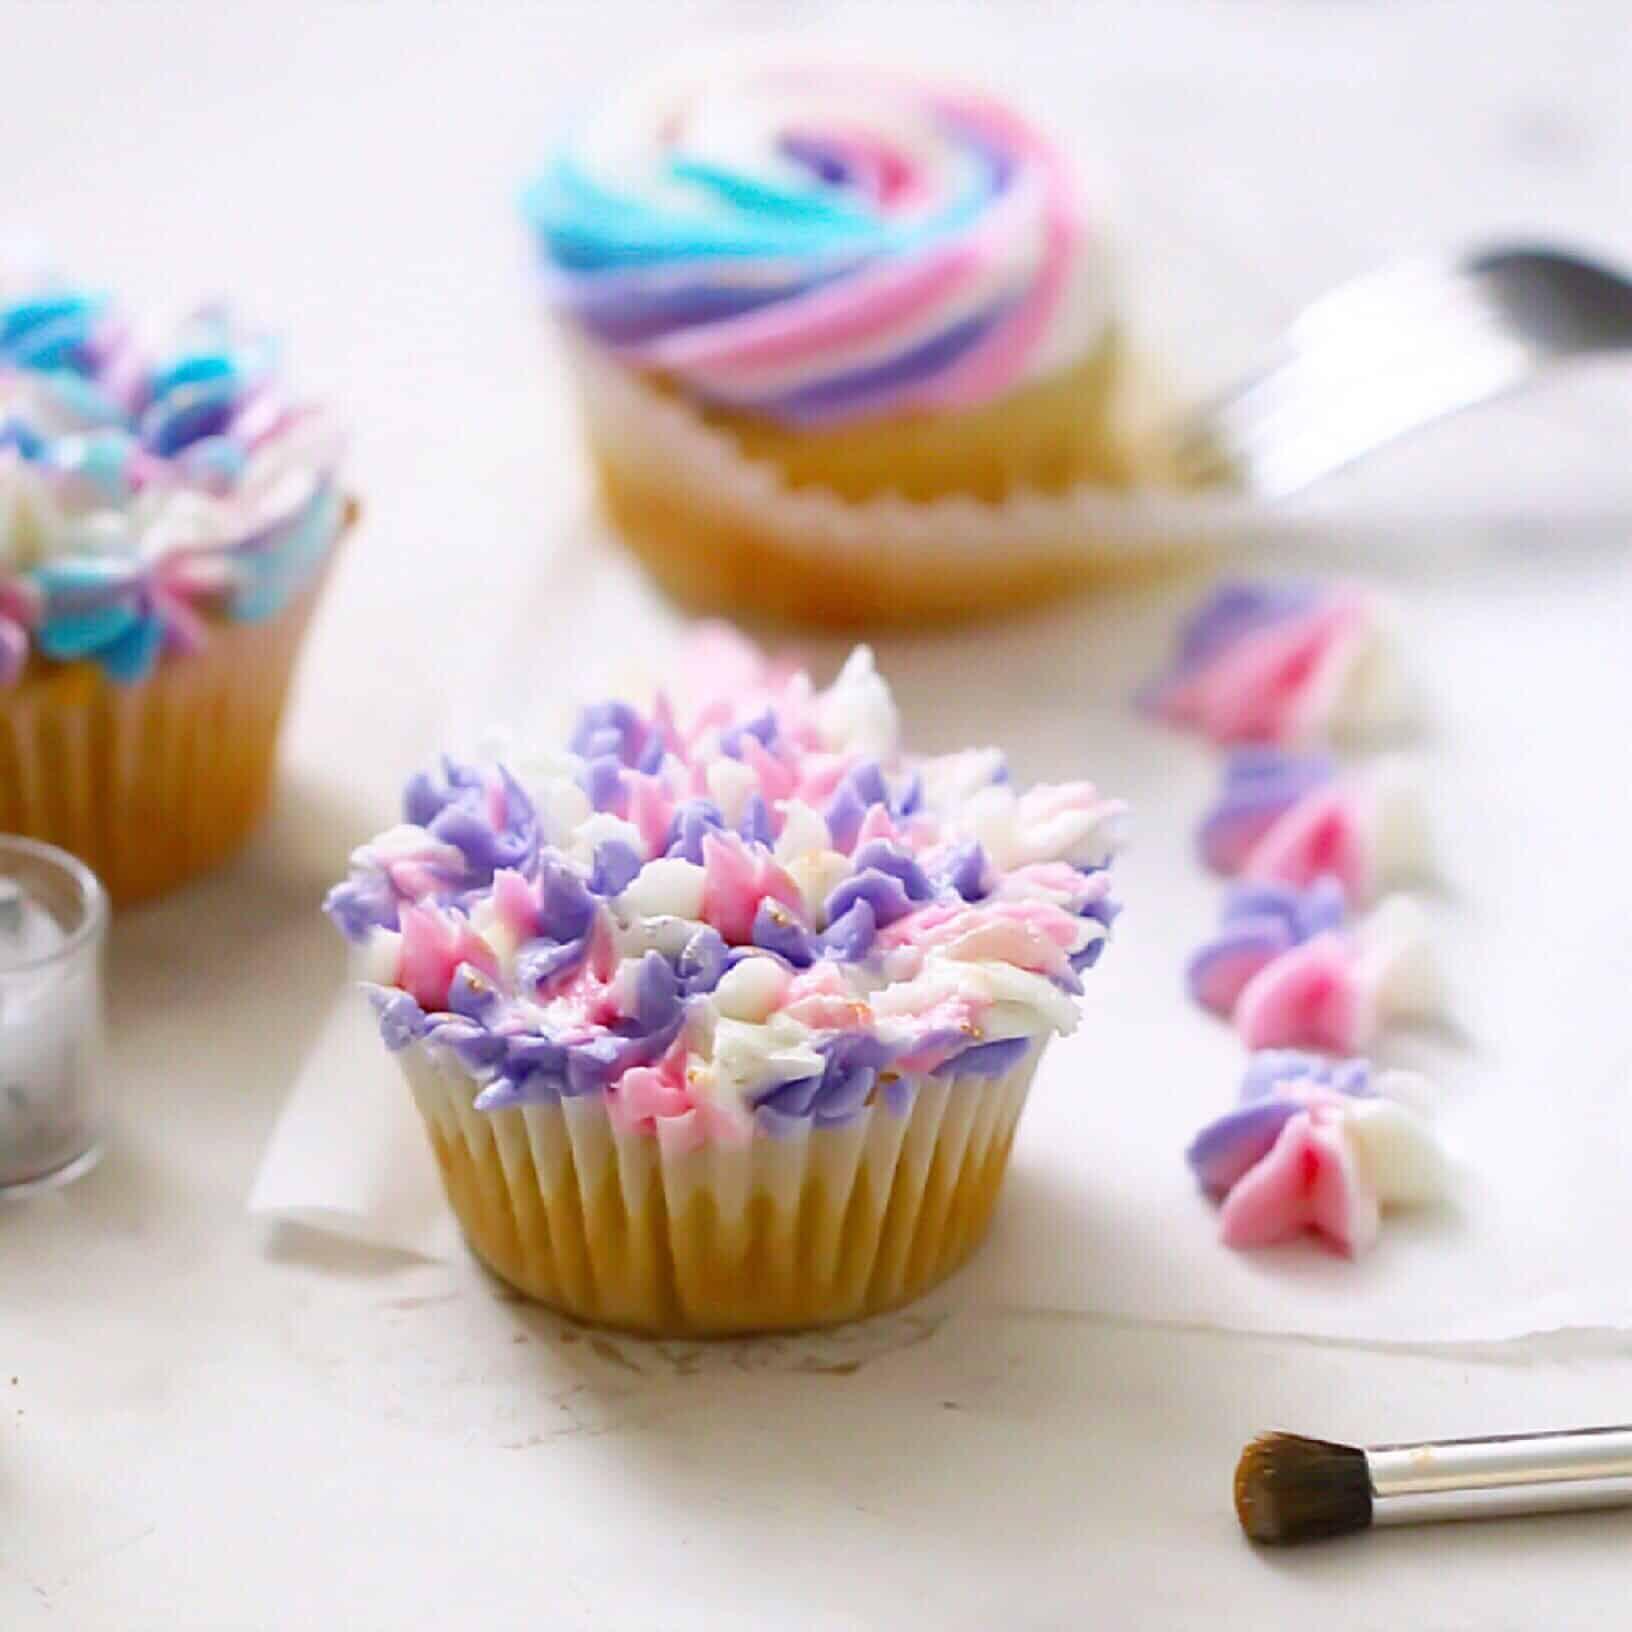 Grain-Free Vanilla Cupcakes